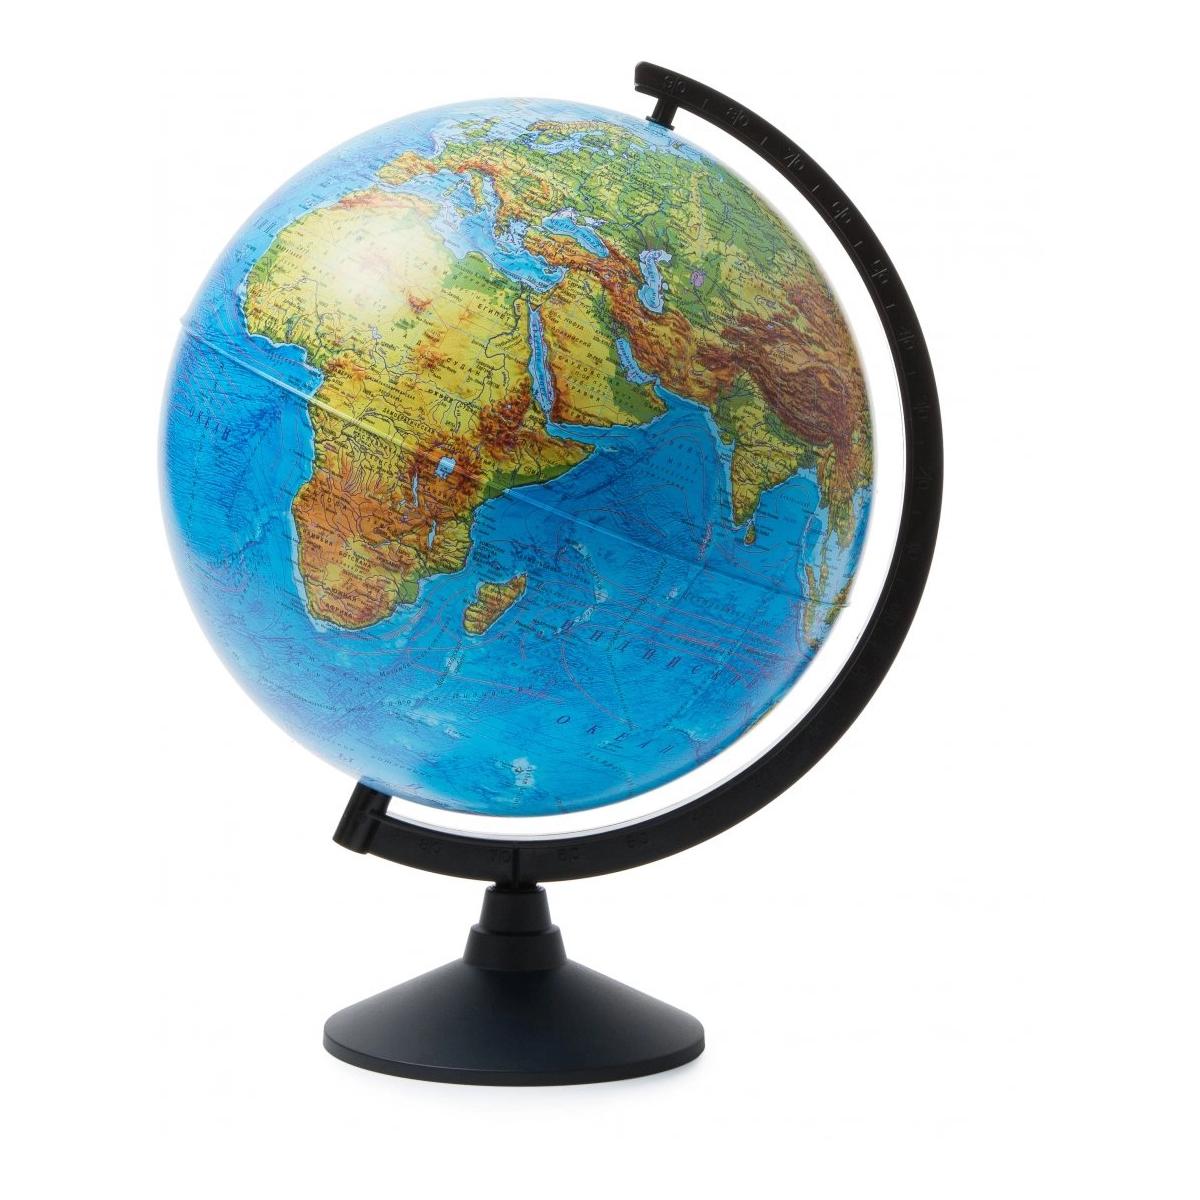 Фото - Глобус Земли Globen физический, 32 см globen глобус земли globen физический с подсветкой 150 мм